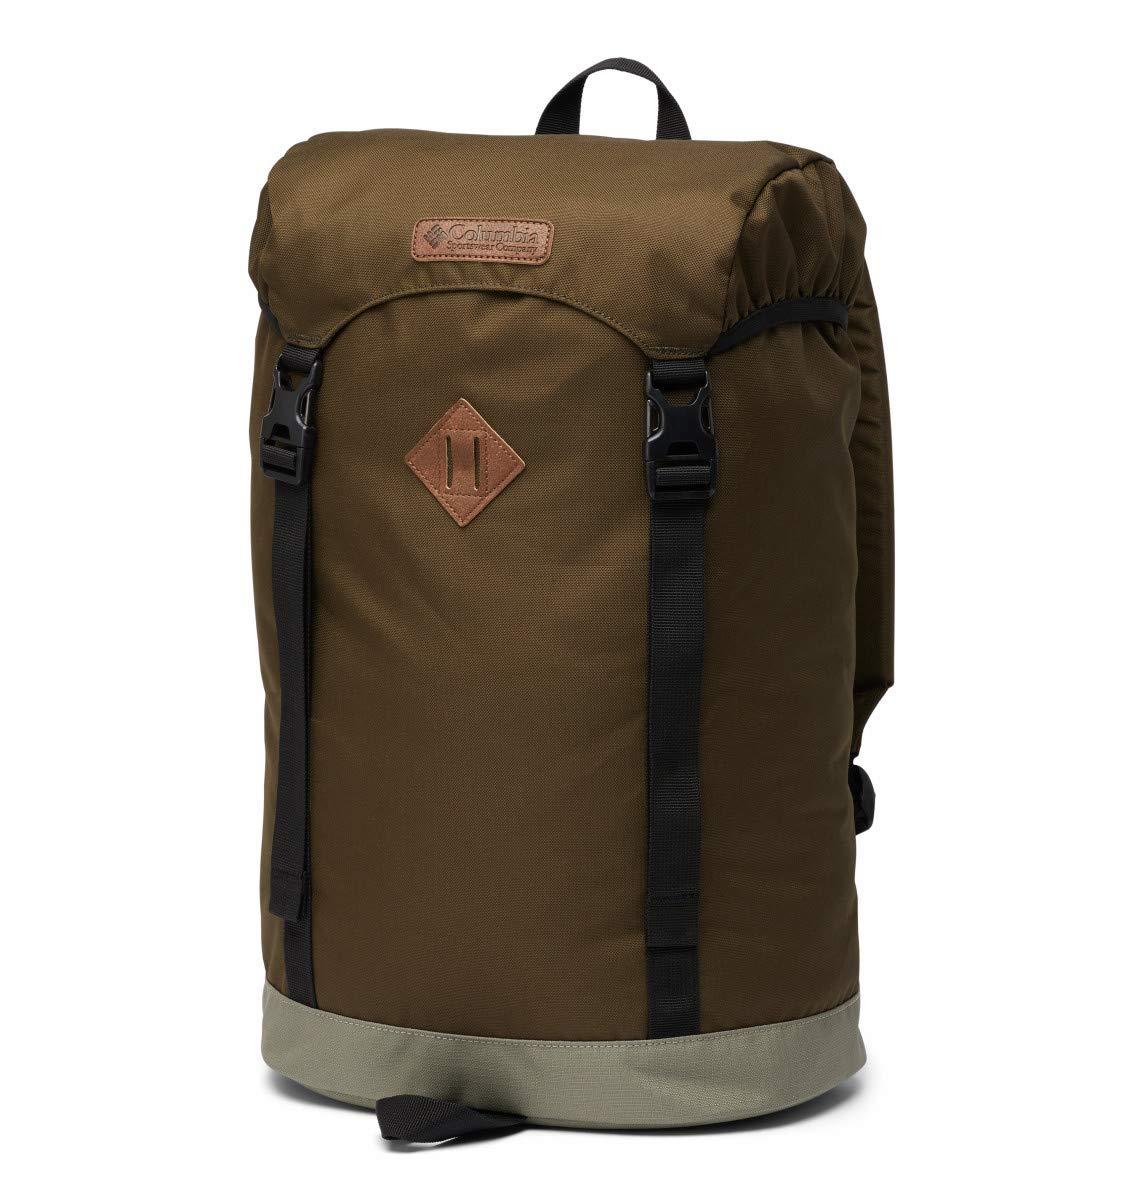 Columbia Daypack / Rucksack, Classic Outdoor 25L